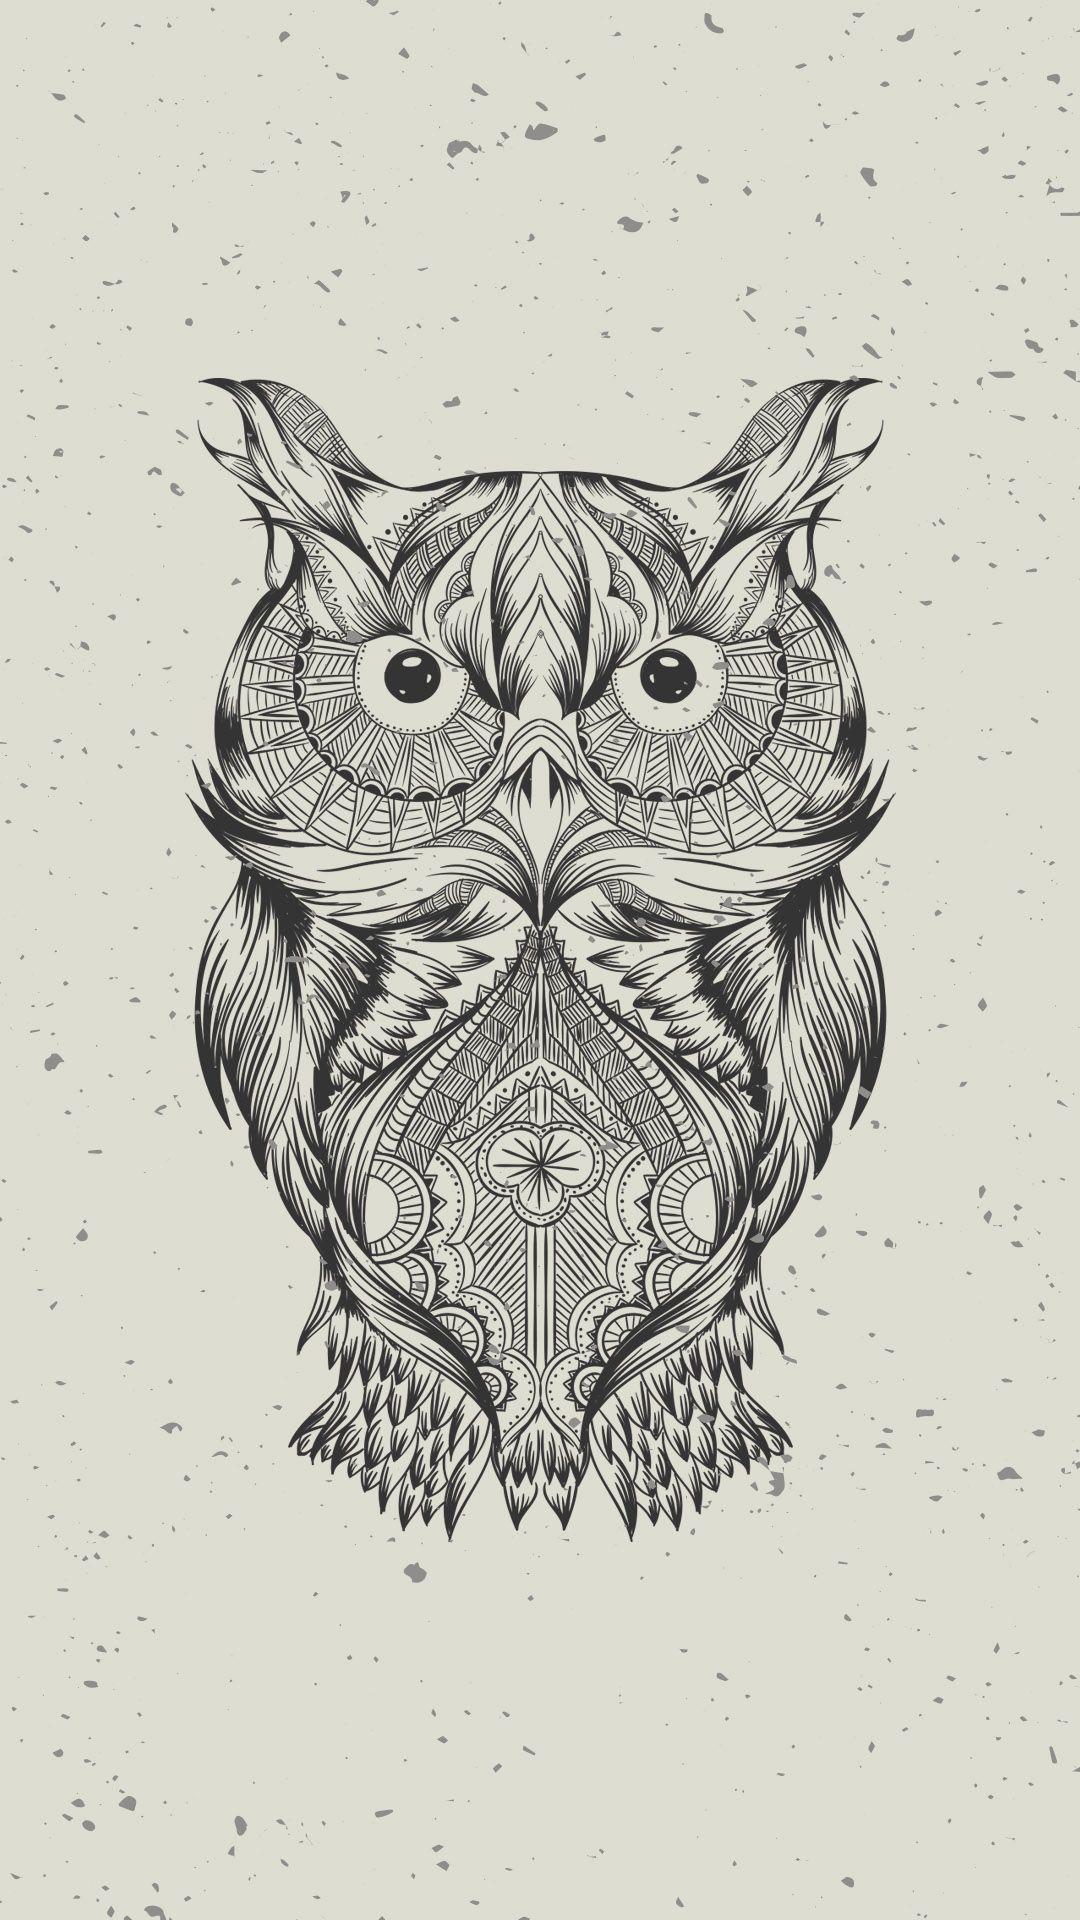 Amazing Wallpaper Home Screen Owl - a8ca5617155d700d5a5102b0c67c6bd2  Pictures_74169.jpg